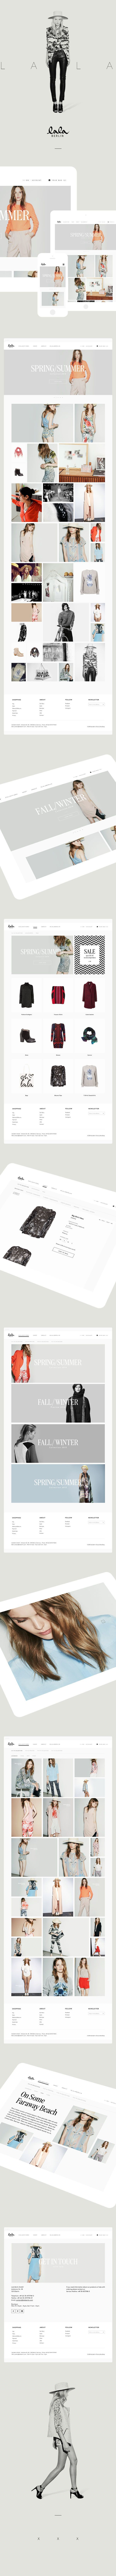 Elegant brand and layout